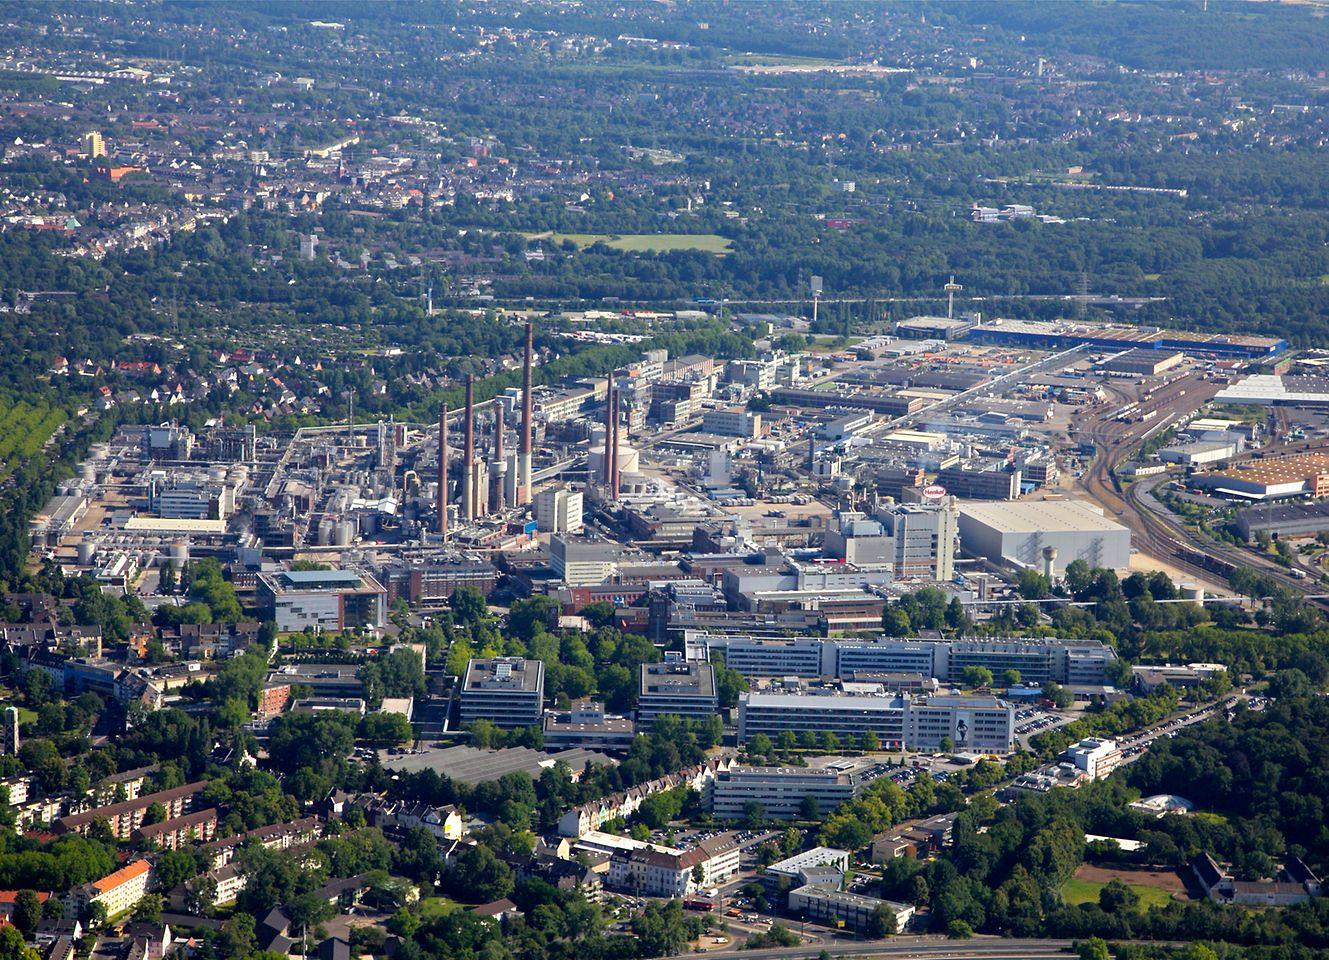 Duesseldorf – the company's headquarters